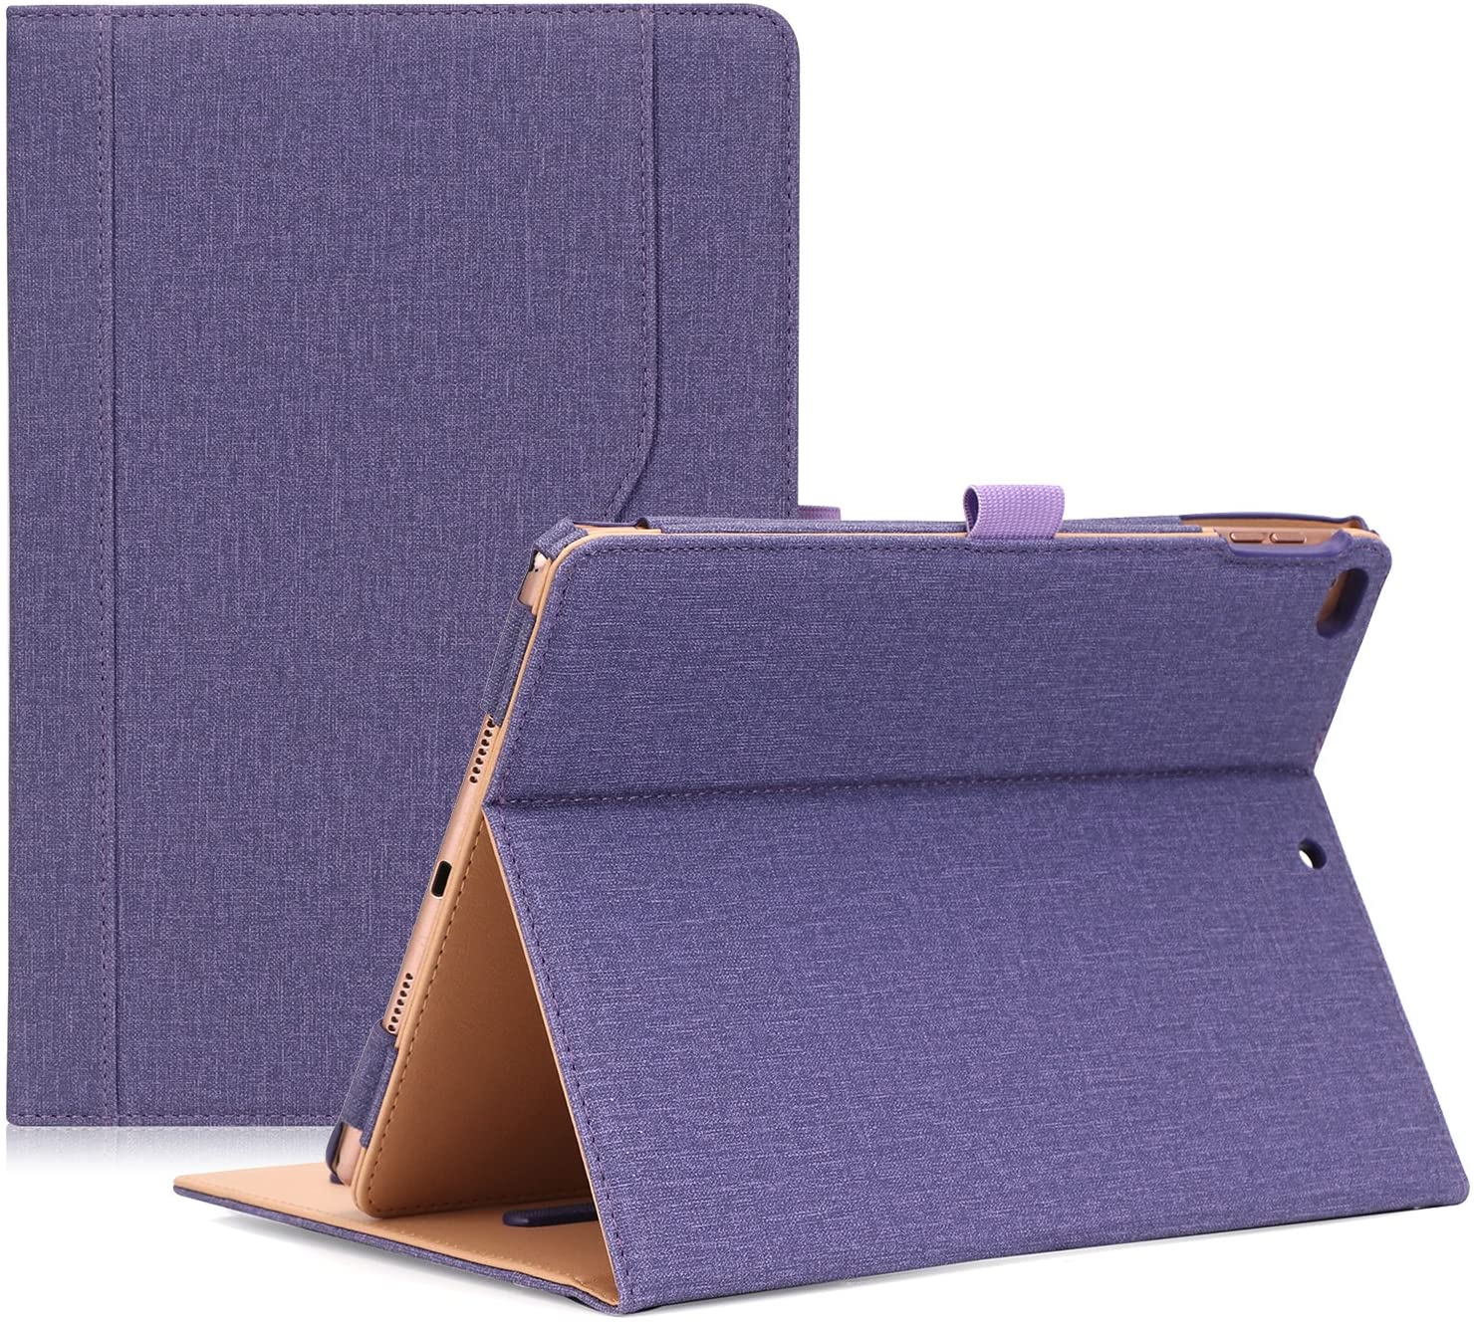 ProCase iPad 9.7 Case 2018/2017 iPad Case - Stand Folio Cover Case for Apple iPad 9.7 inch, Also Fit iPad Air 2 / iPad Air -Purple